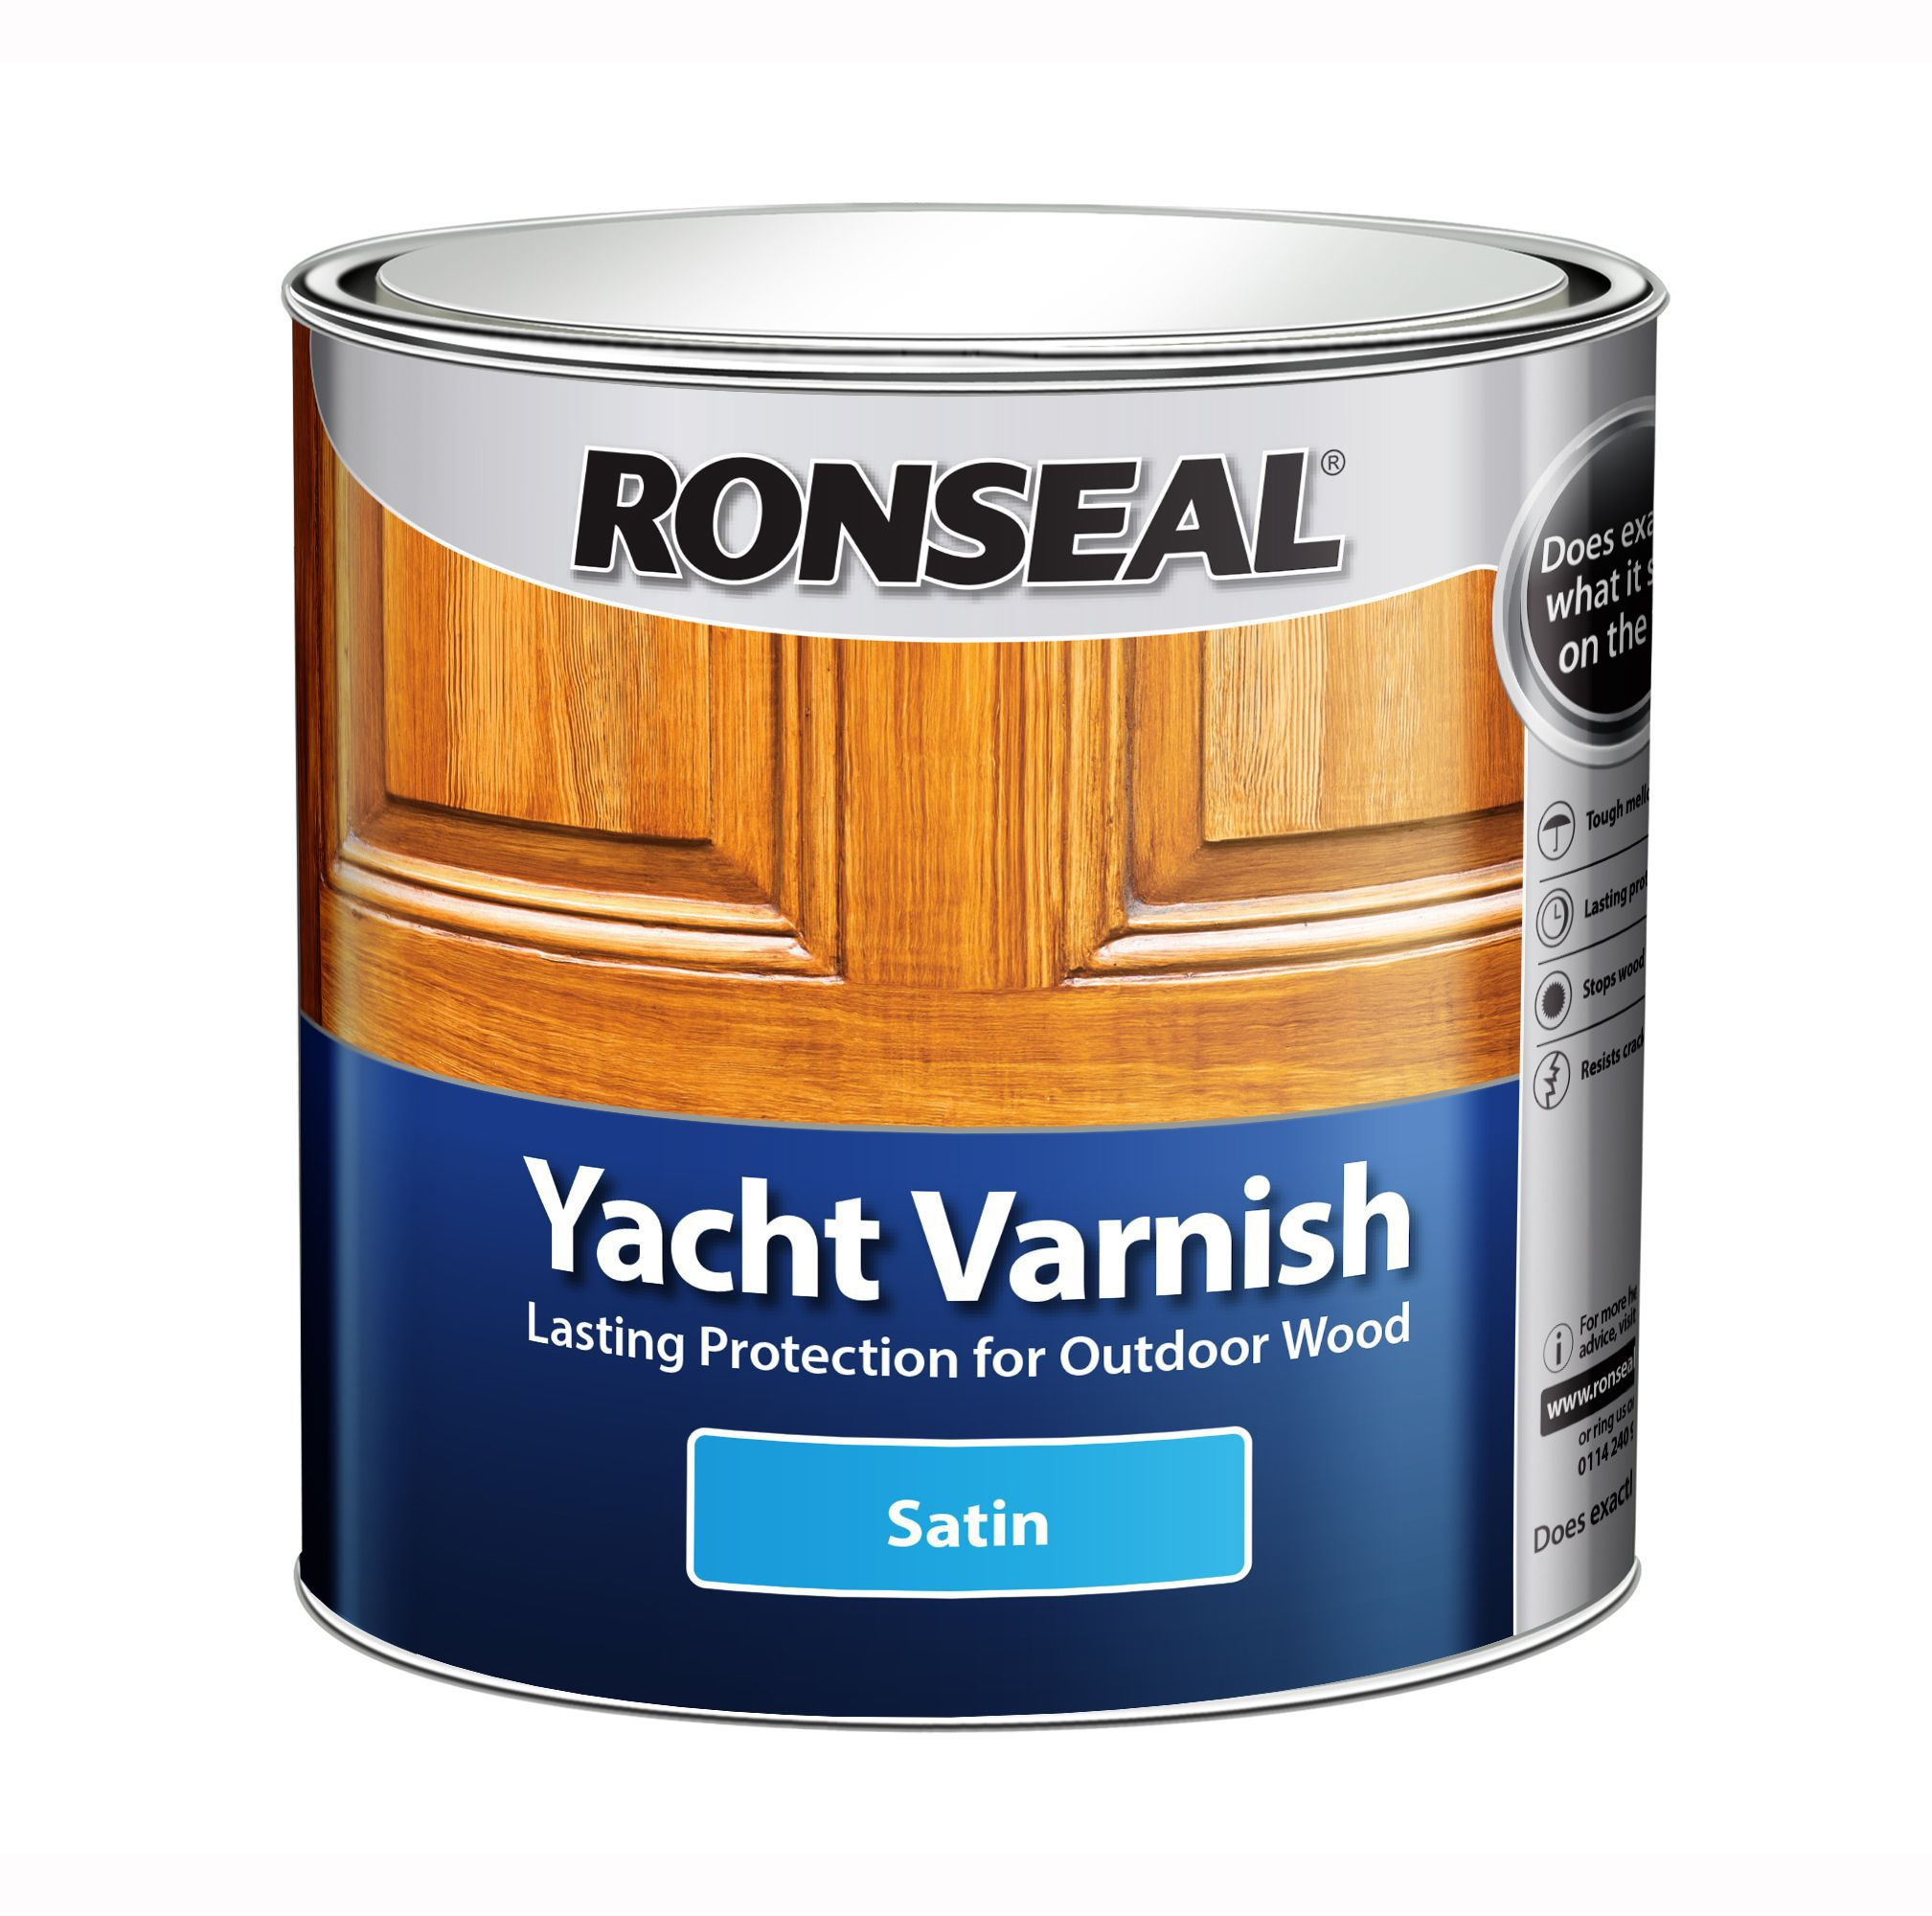 Ronseal Yacht Varnish  Satin 1L